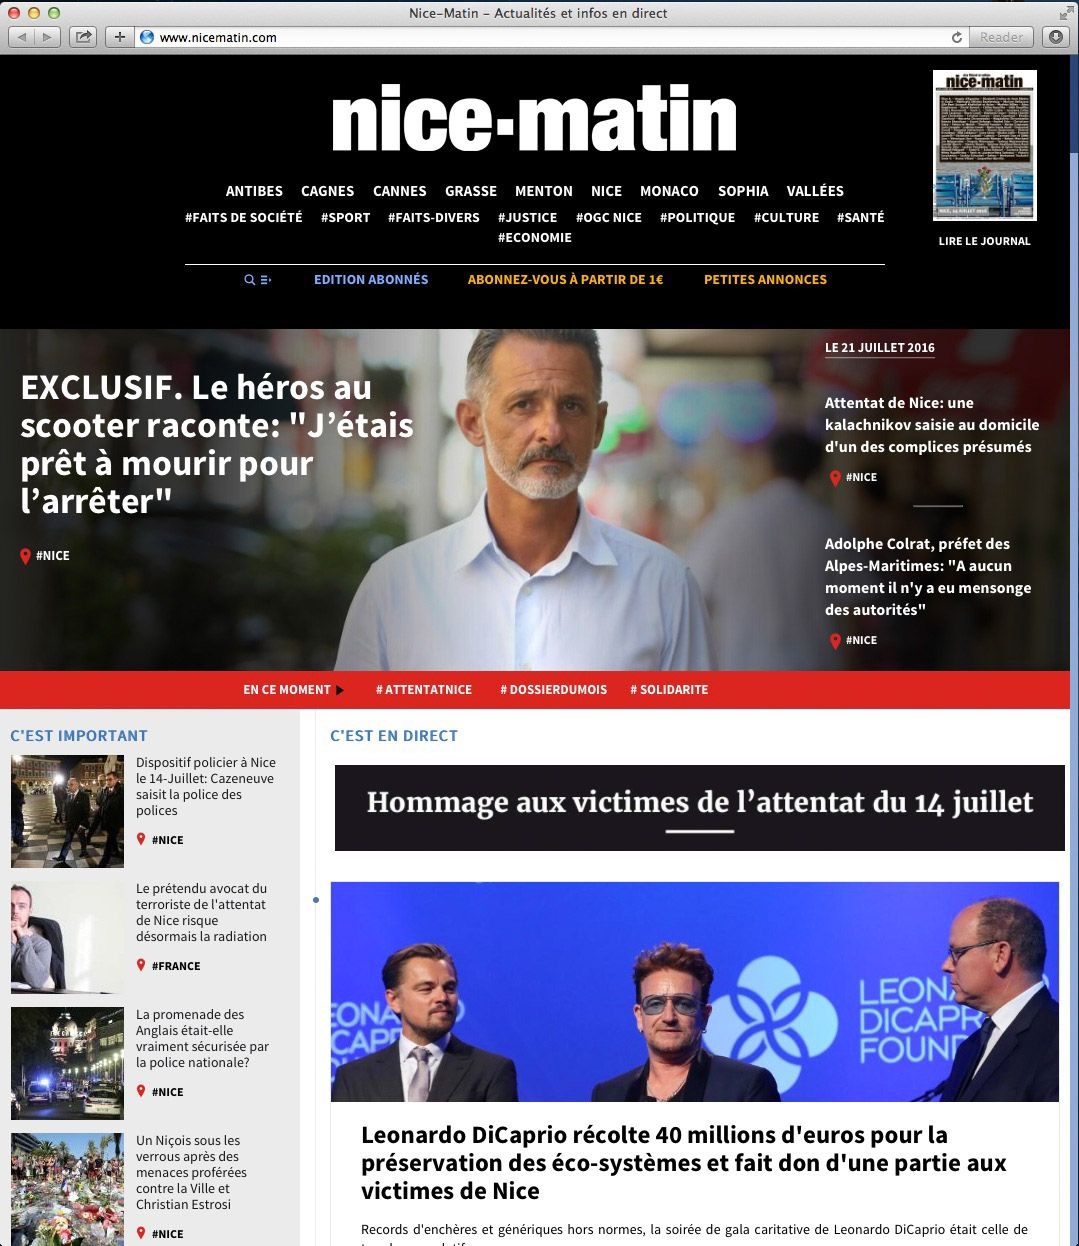 EINMALIGE VERWENDUNG Screenshot / www.nicematin.com